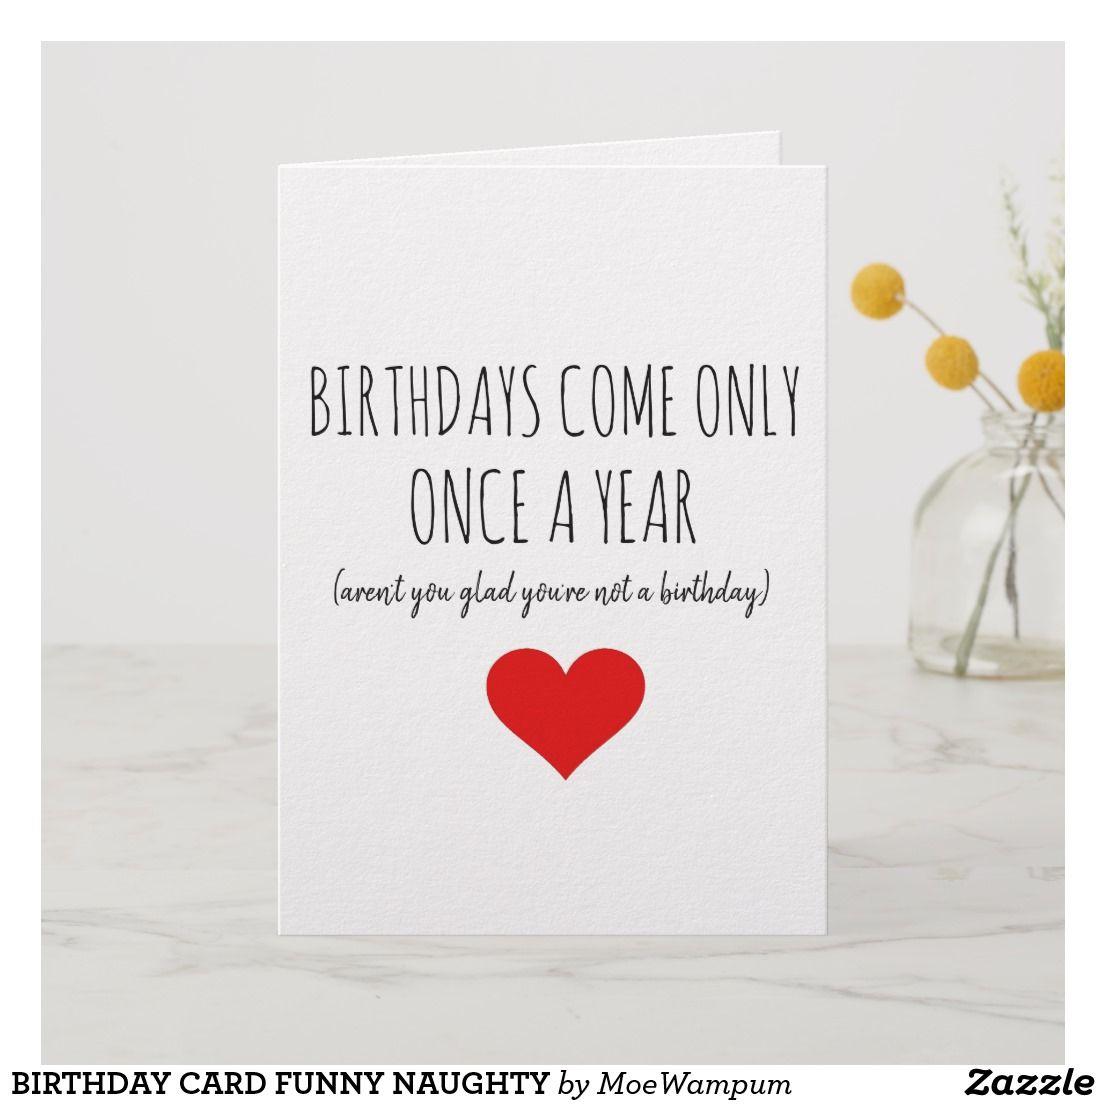 Birthday Card Love Card I Like You How I Like My Whiskey Funny Card Anniversary Naughty Card for Boyfriend Digital Dirty Card for Husband